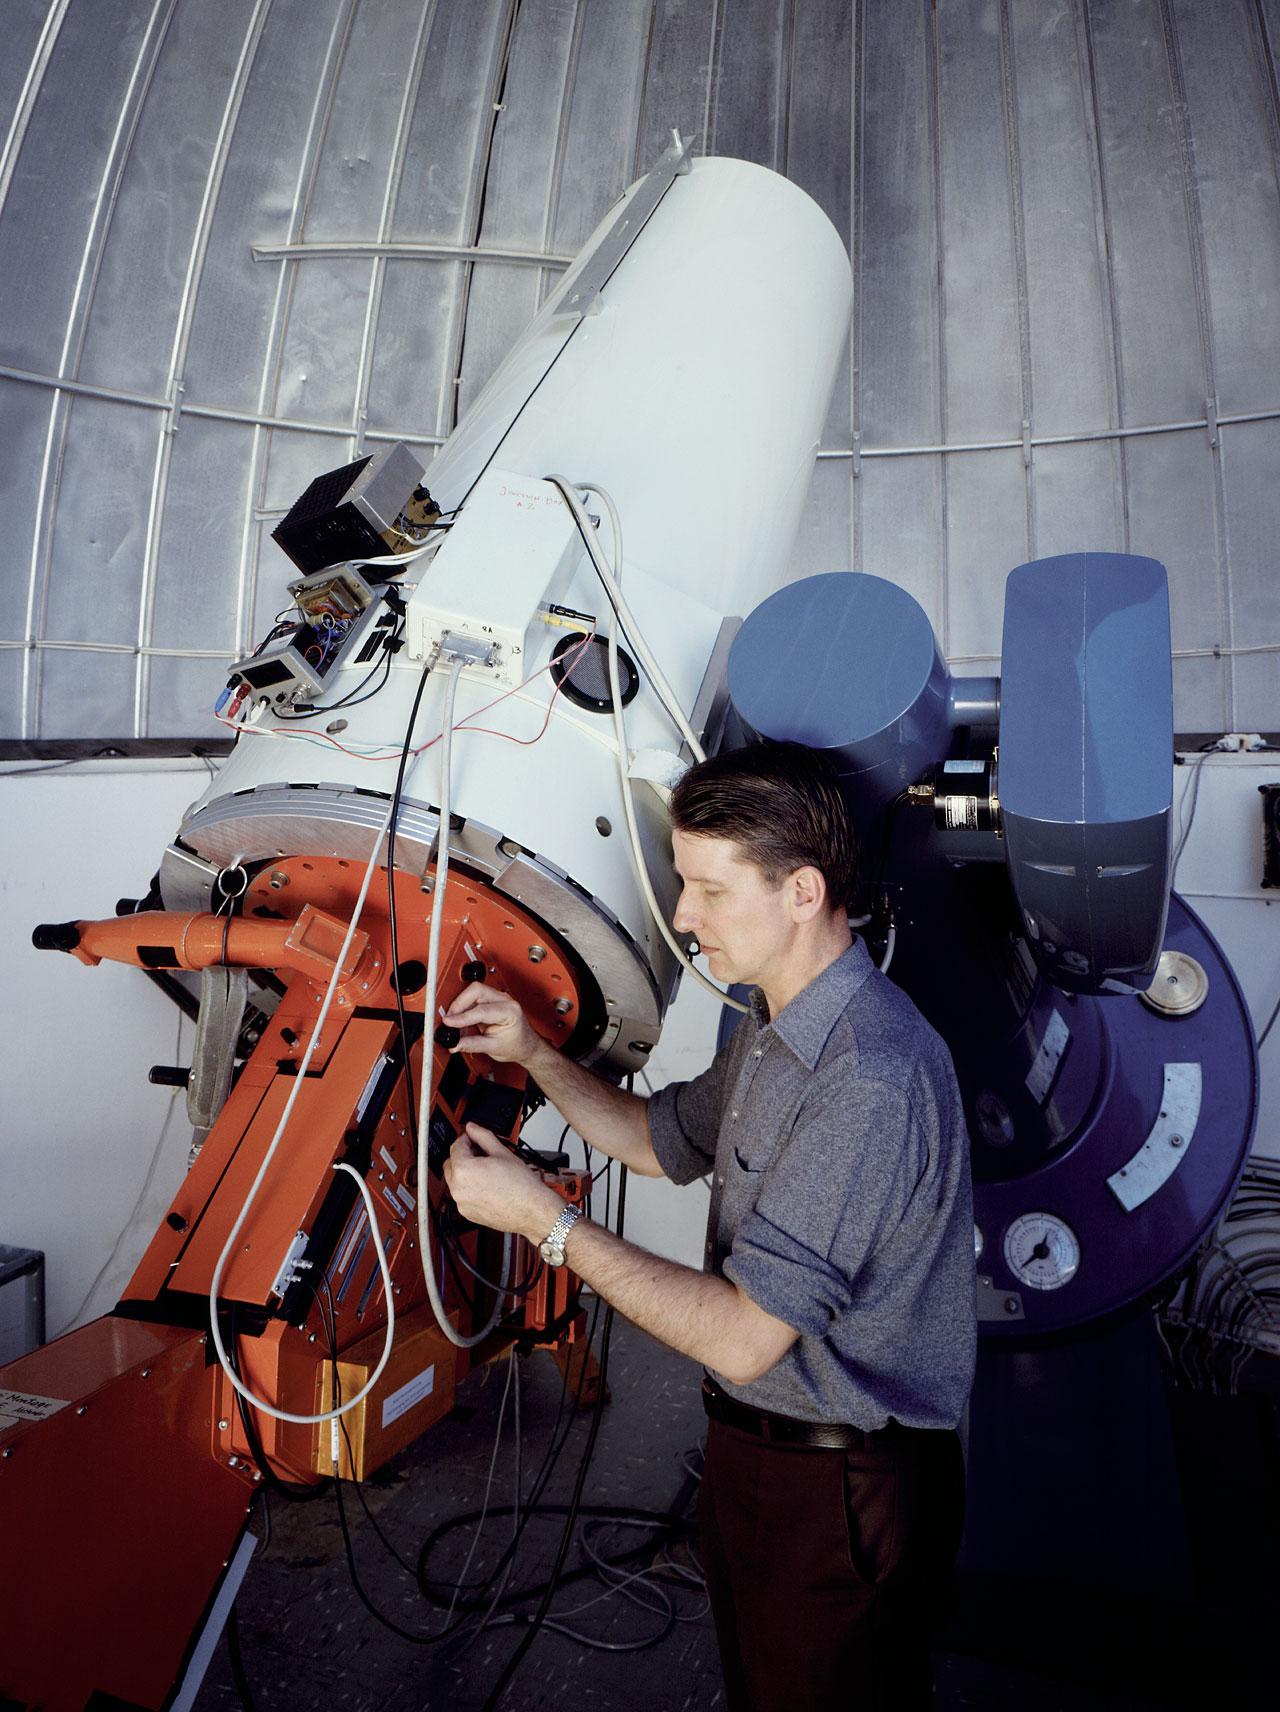 The Bochum 0.61-metre telescope